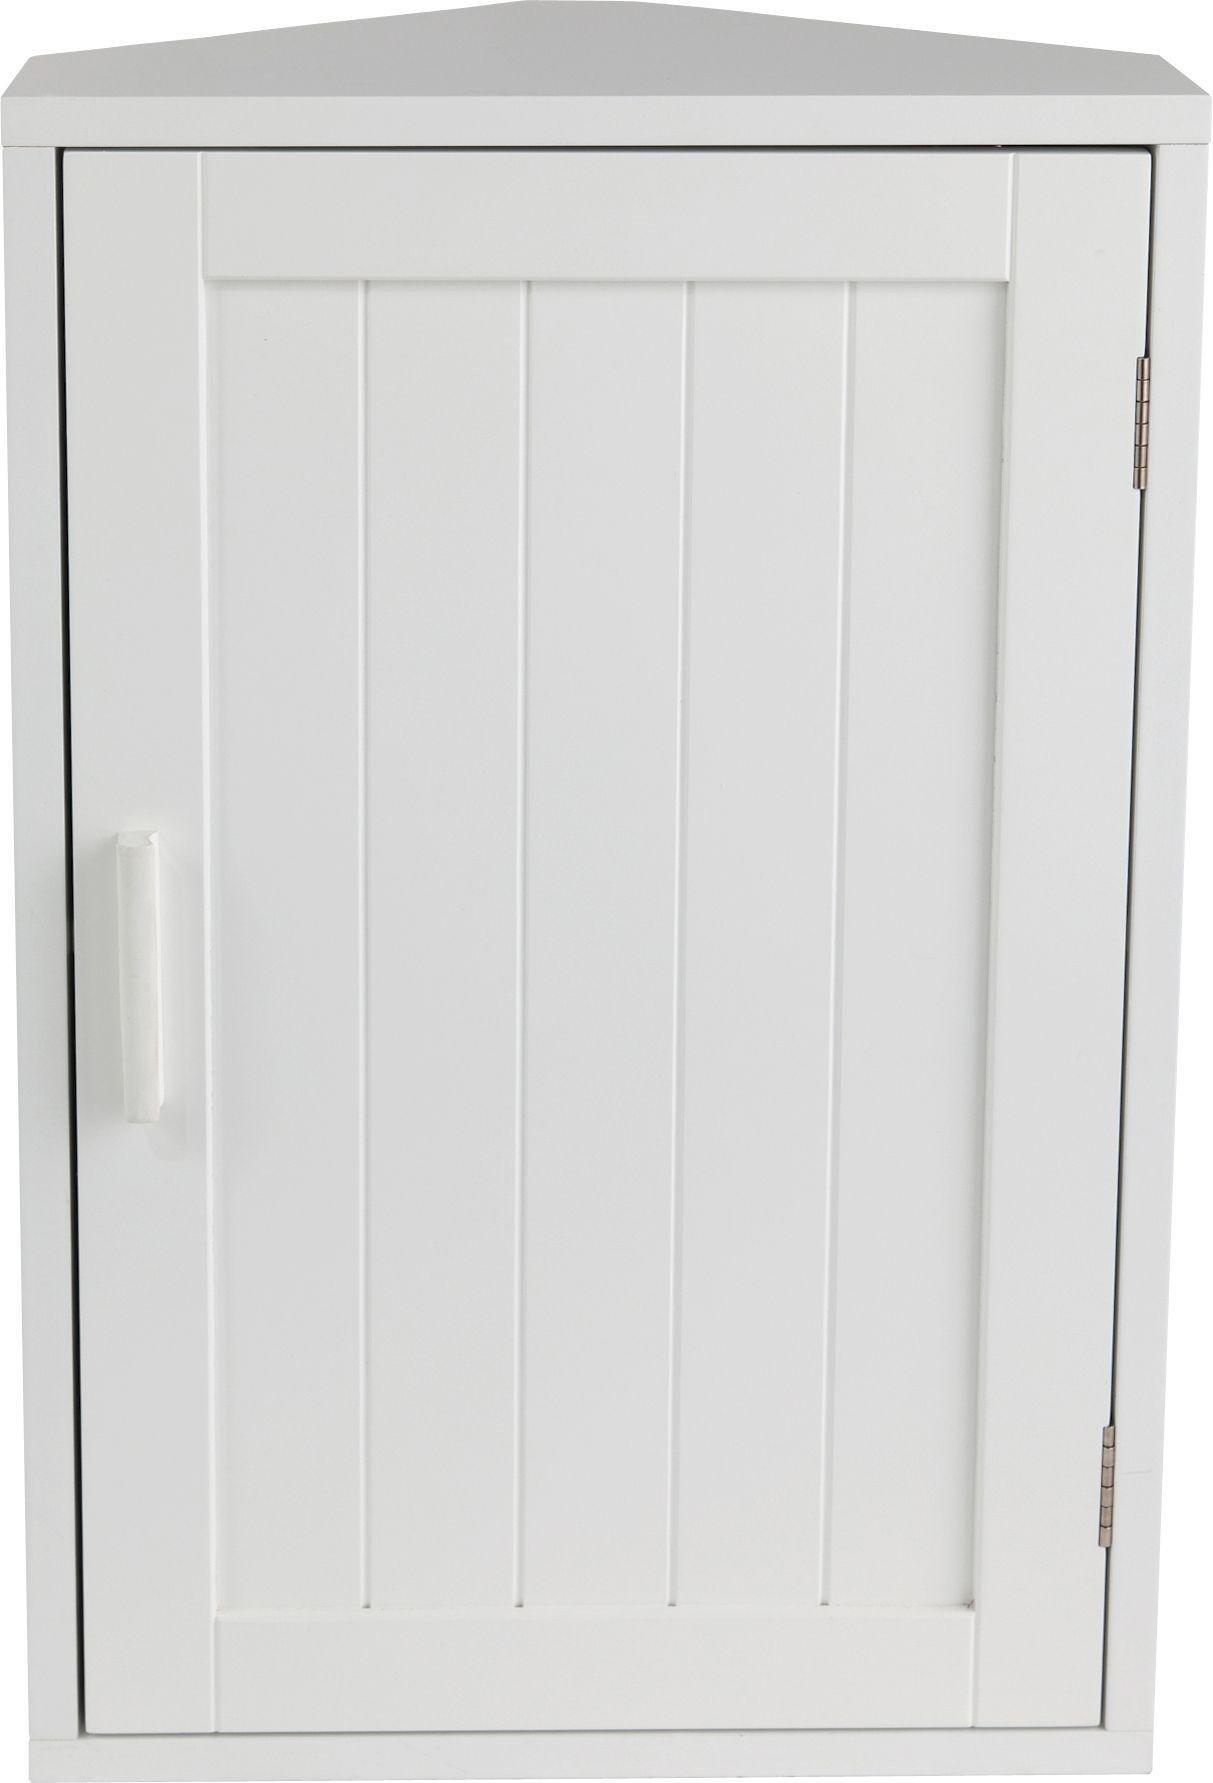 Corner Bathroom Cabinets Uk bathroom storage furniture uk. good looking bathroom cabinets over